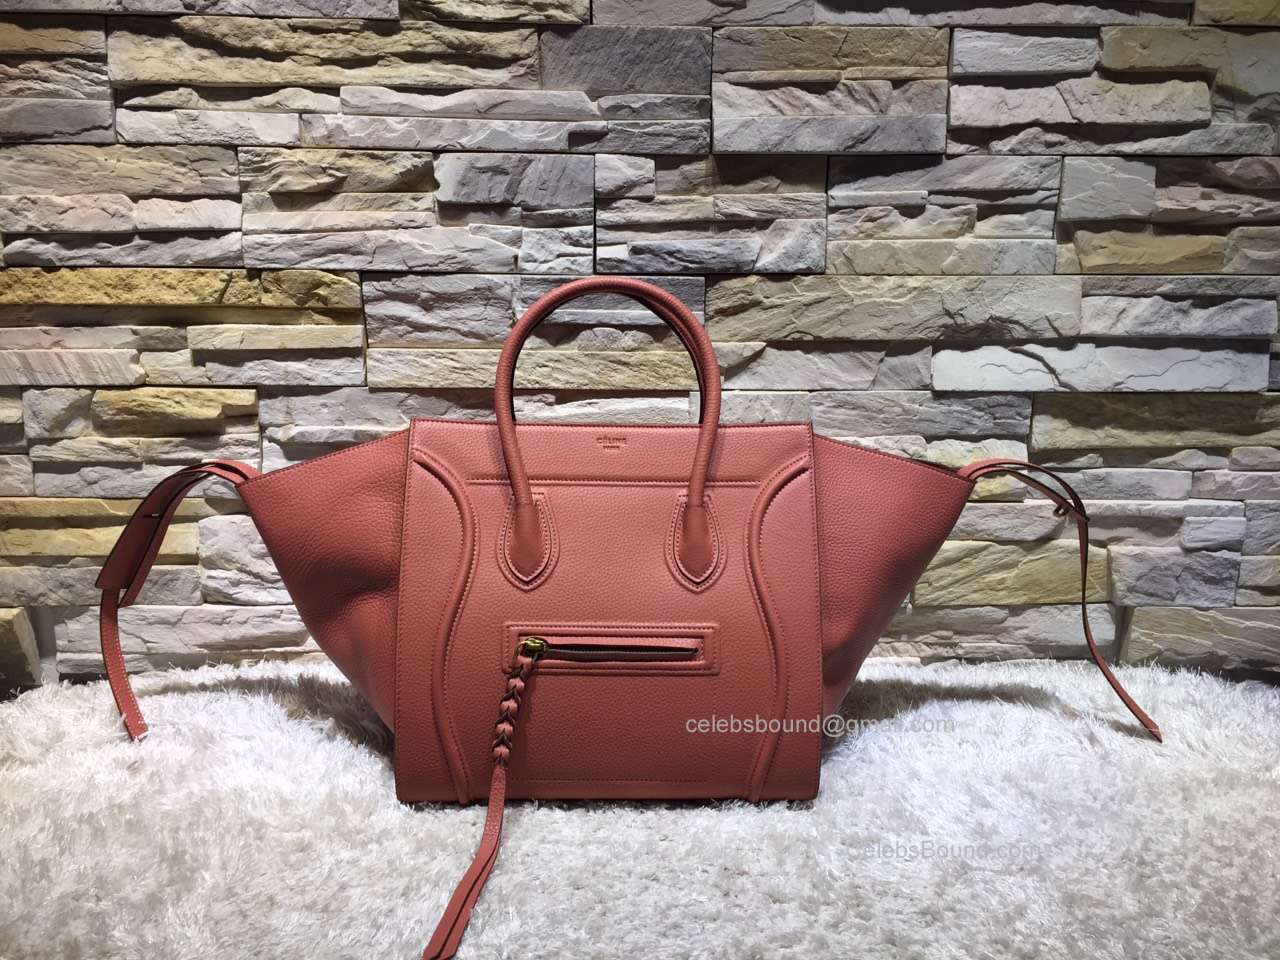 7e8ecc9c3507e Replica Celine Medium Luggage Phantom Bag in Light Red Baby Grained Calfskin